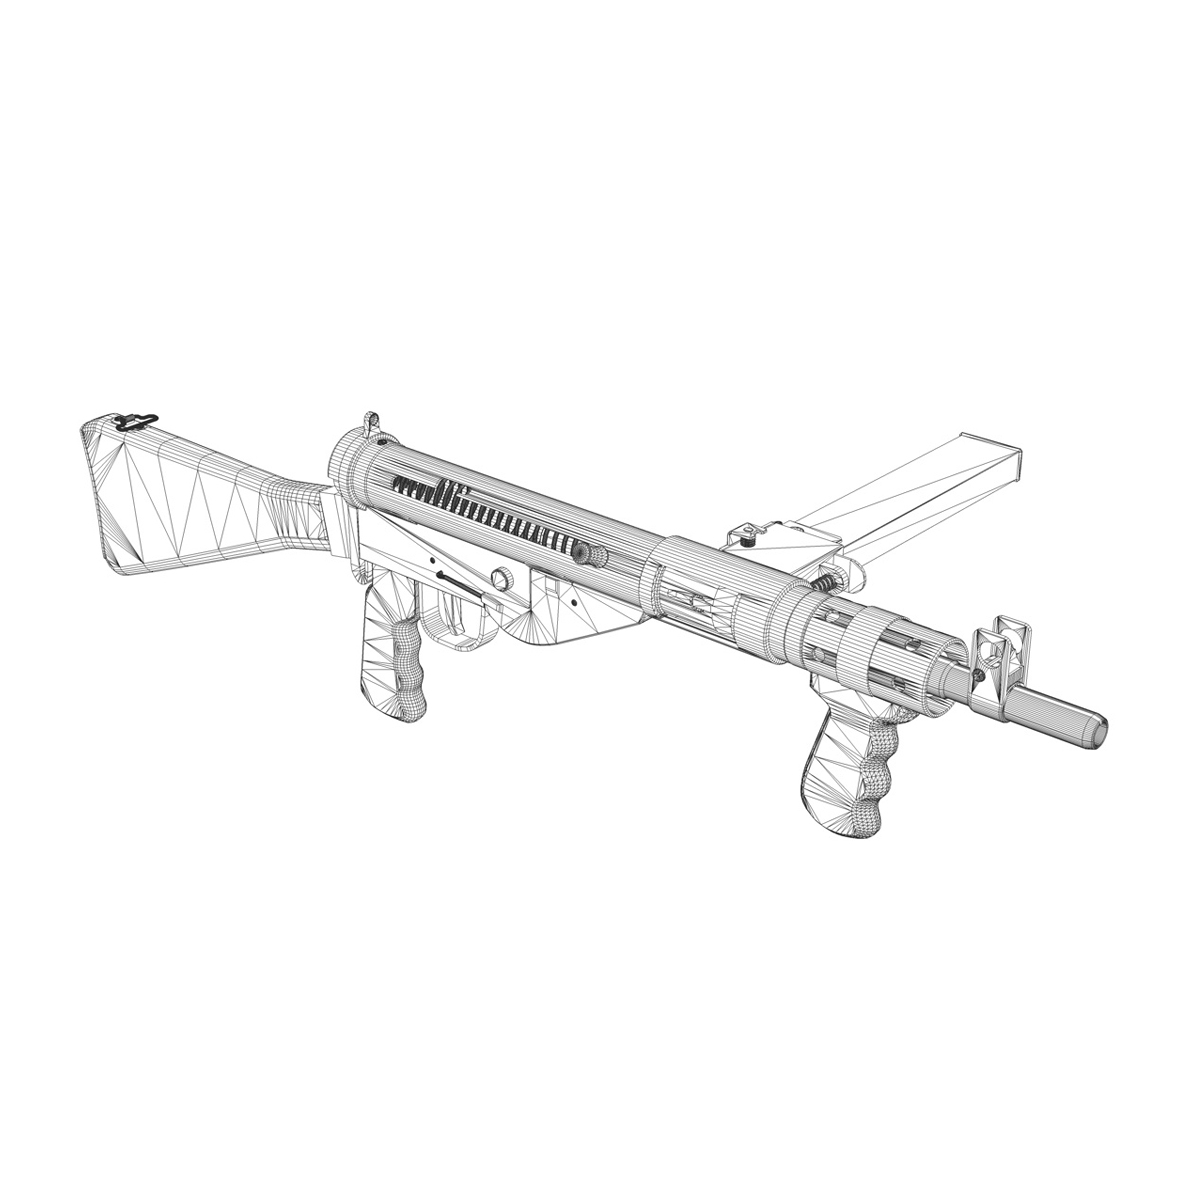 1200x1200 Sten Mk.v Submachine Gun 3d Model Weapons 3d Models Submachine Gun